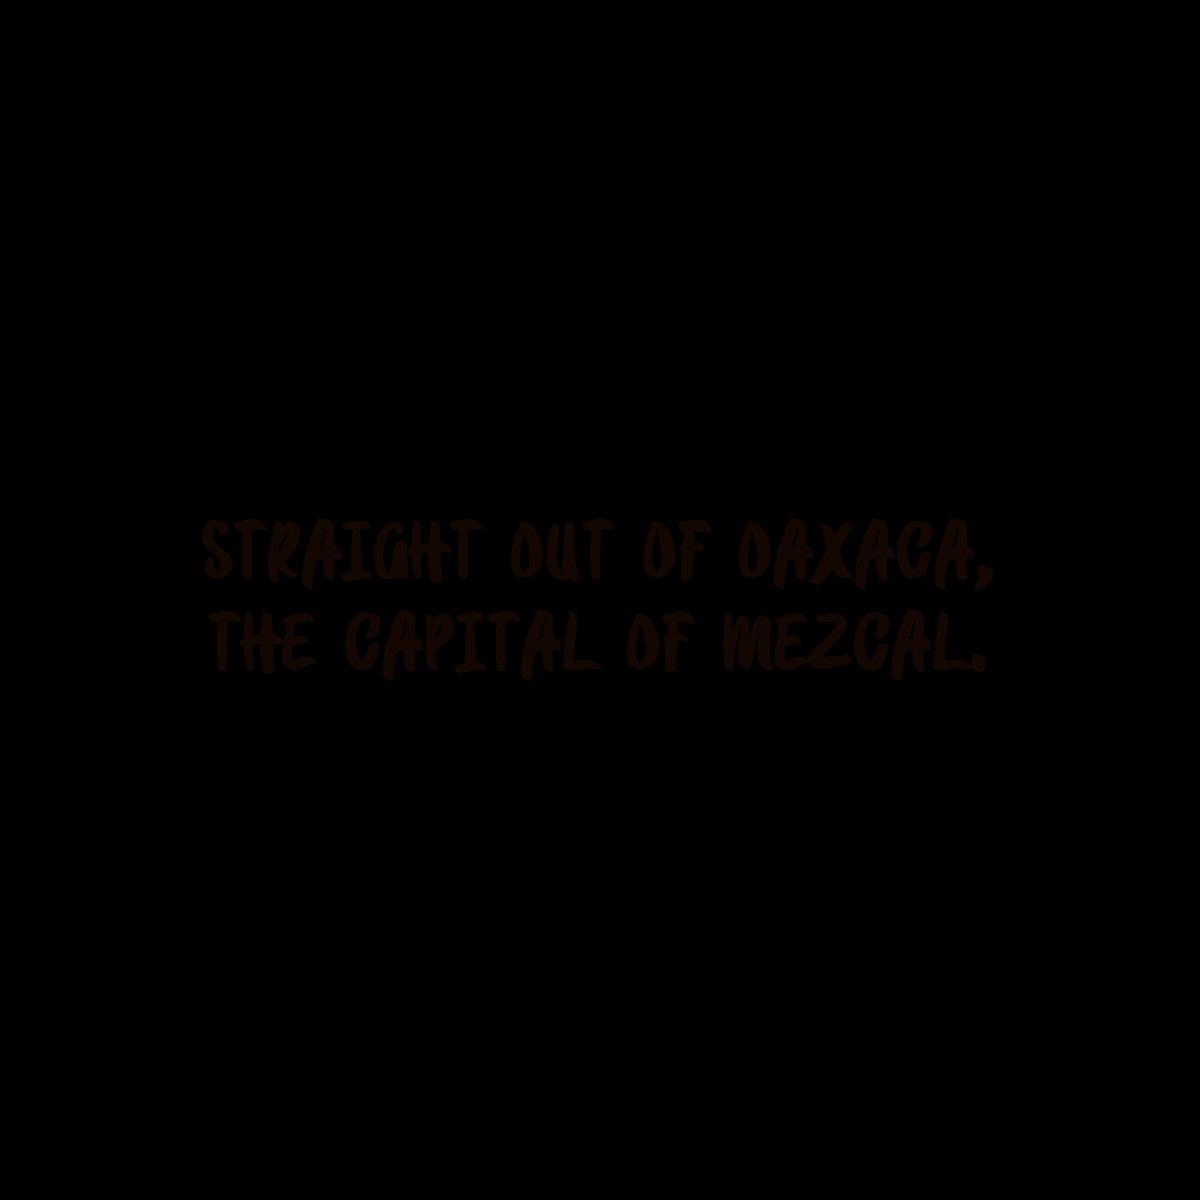 05-straight-out-oaxaca-mezcal